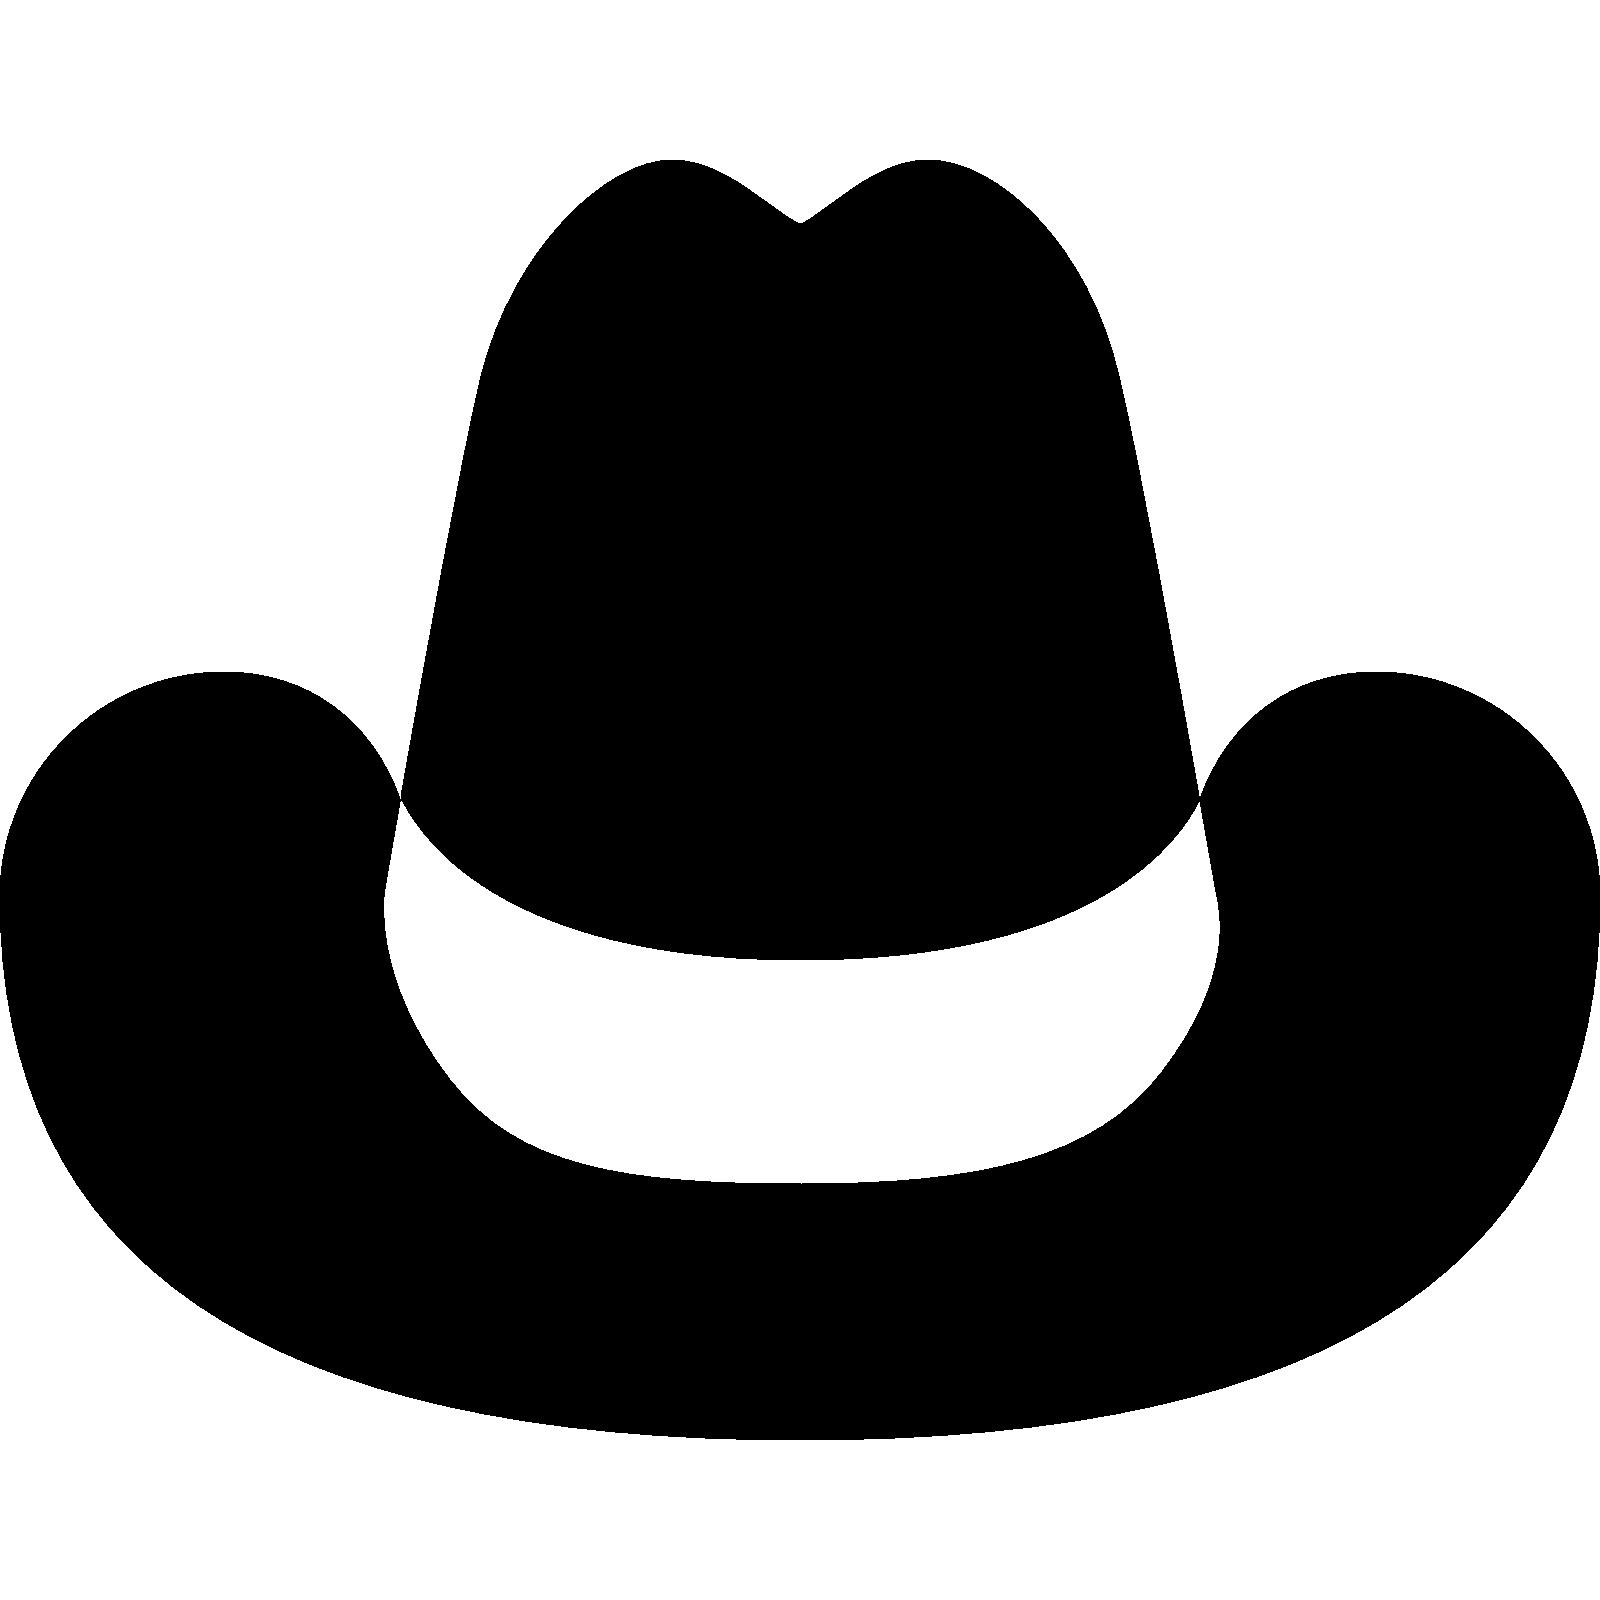 1600x1600 Drawing Cowboy Hat Png Group